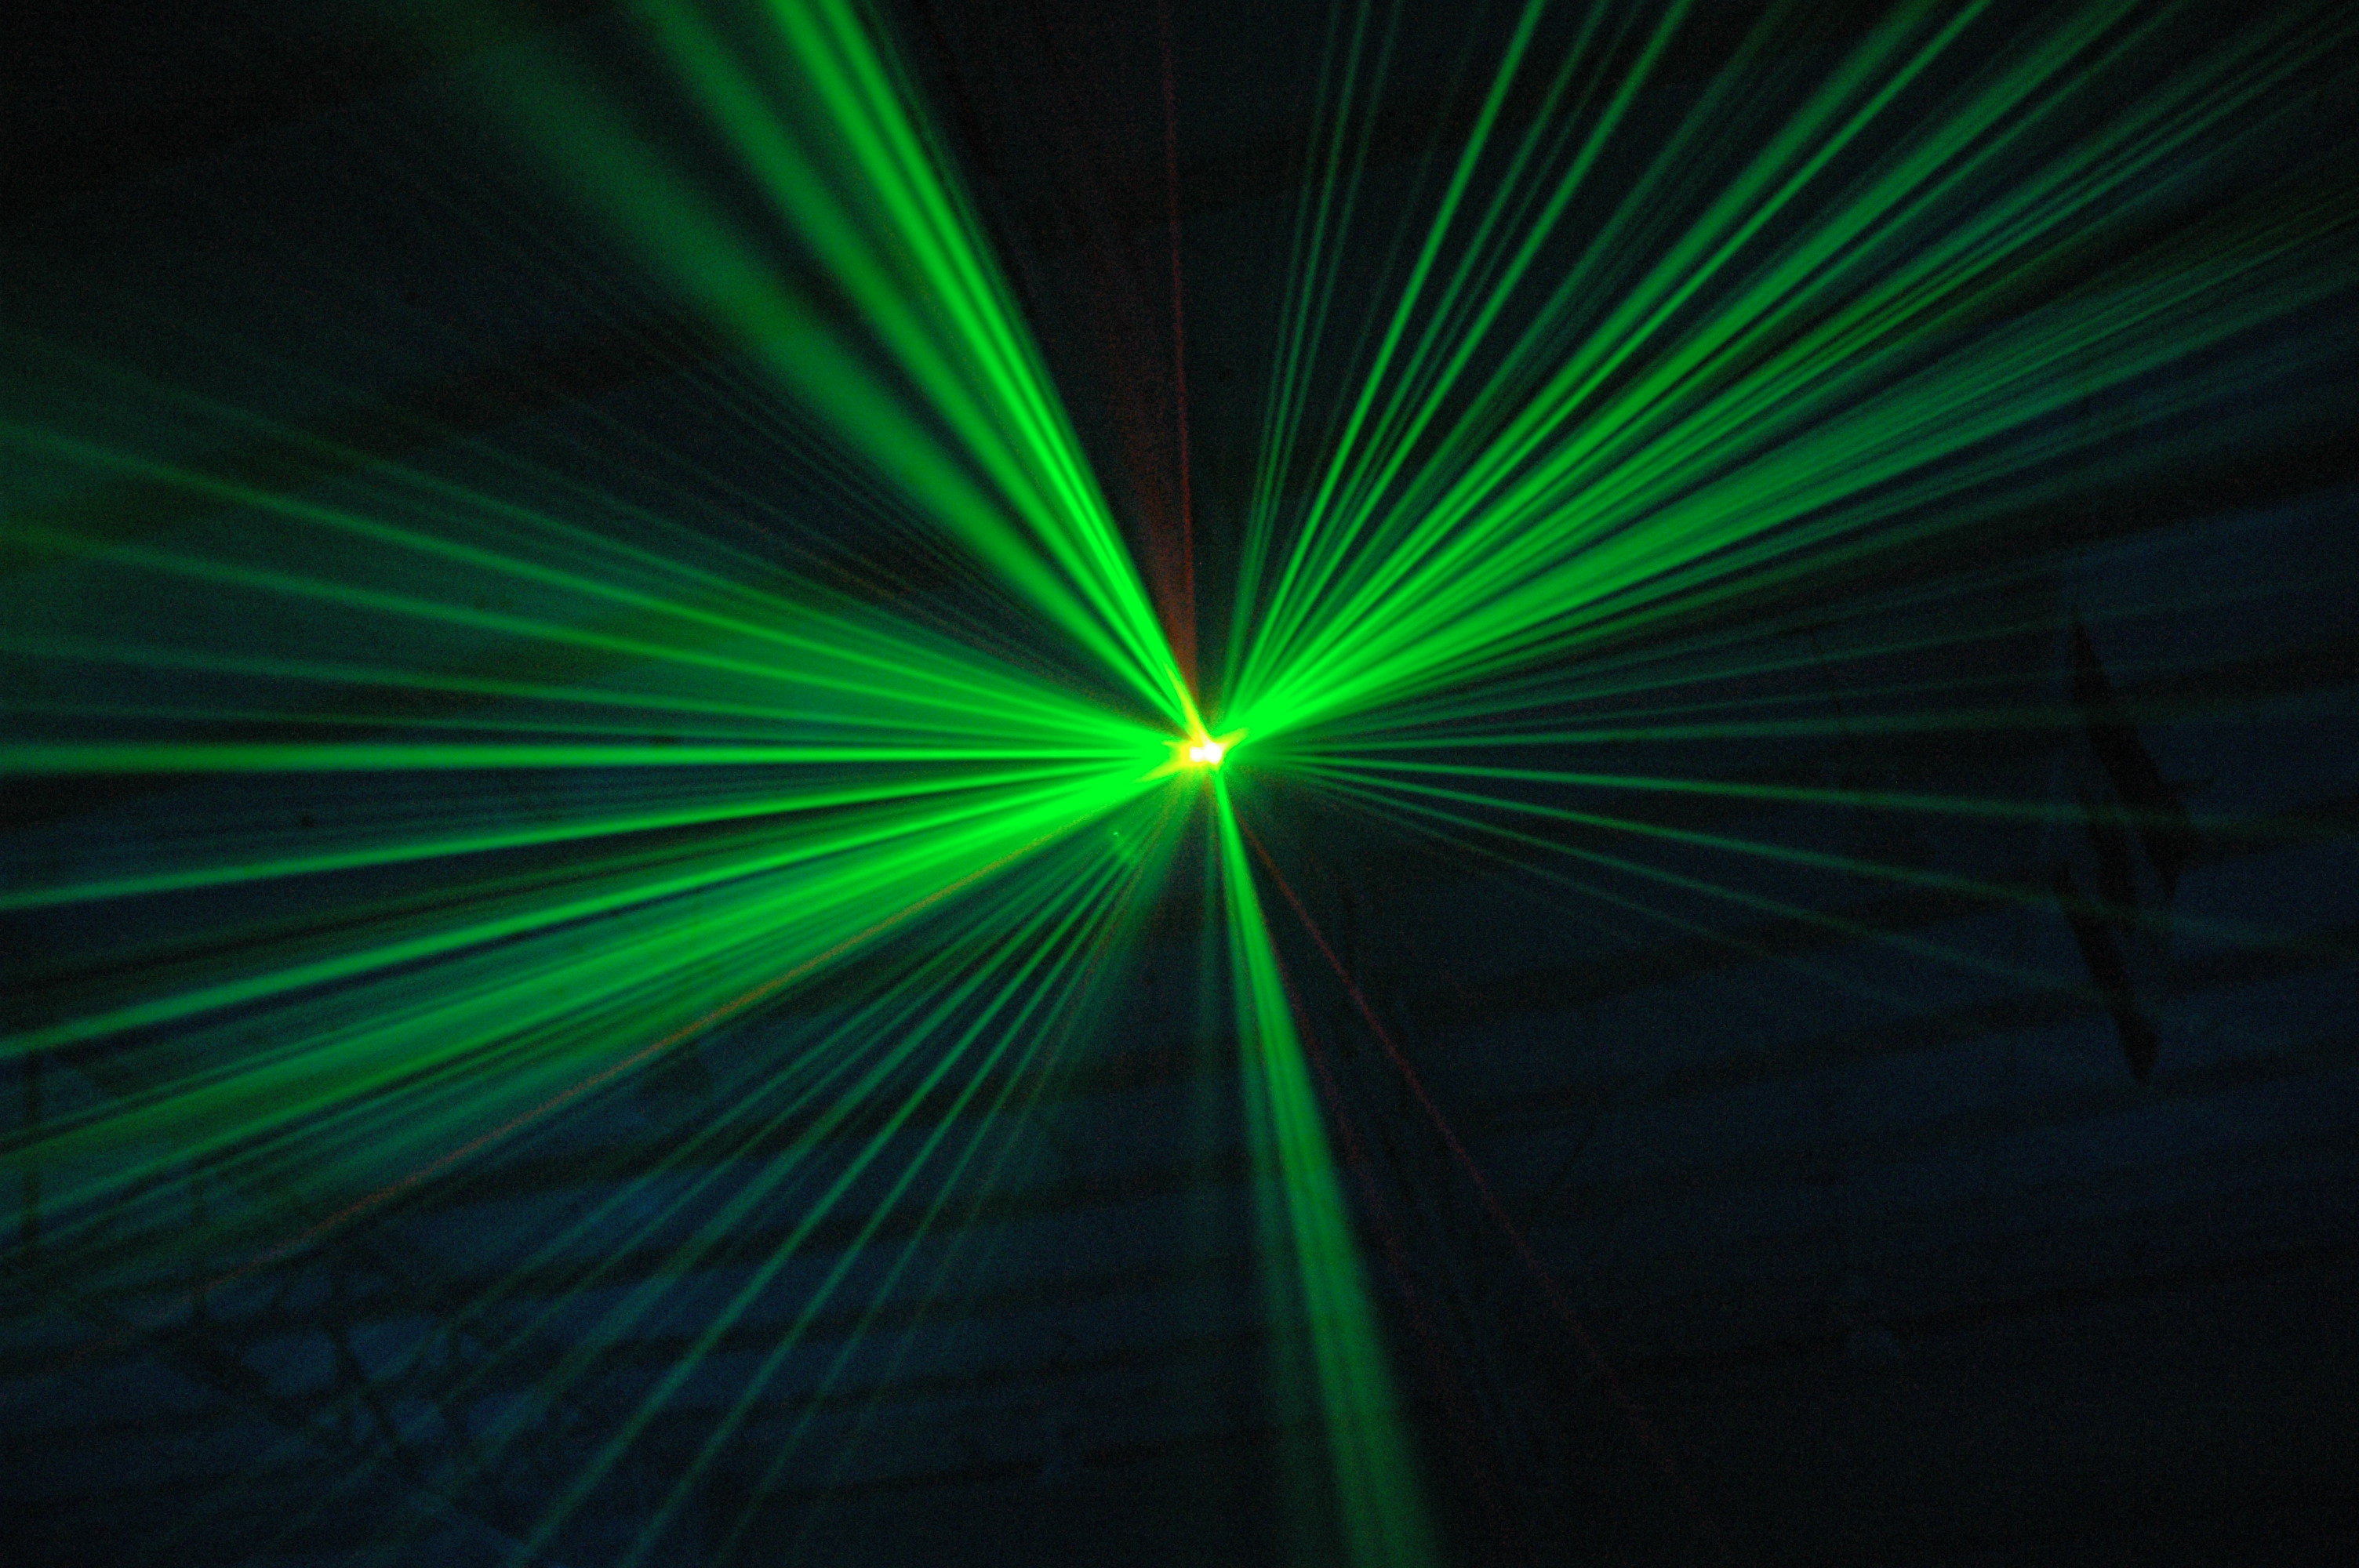 laser light show - photo #25